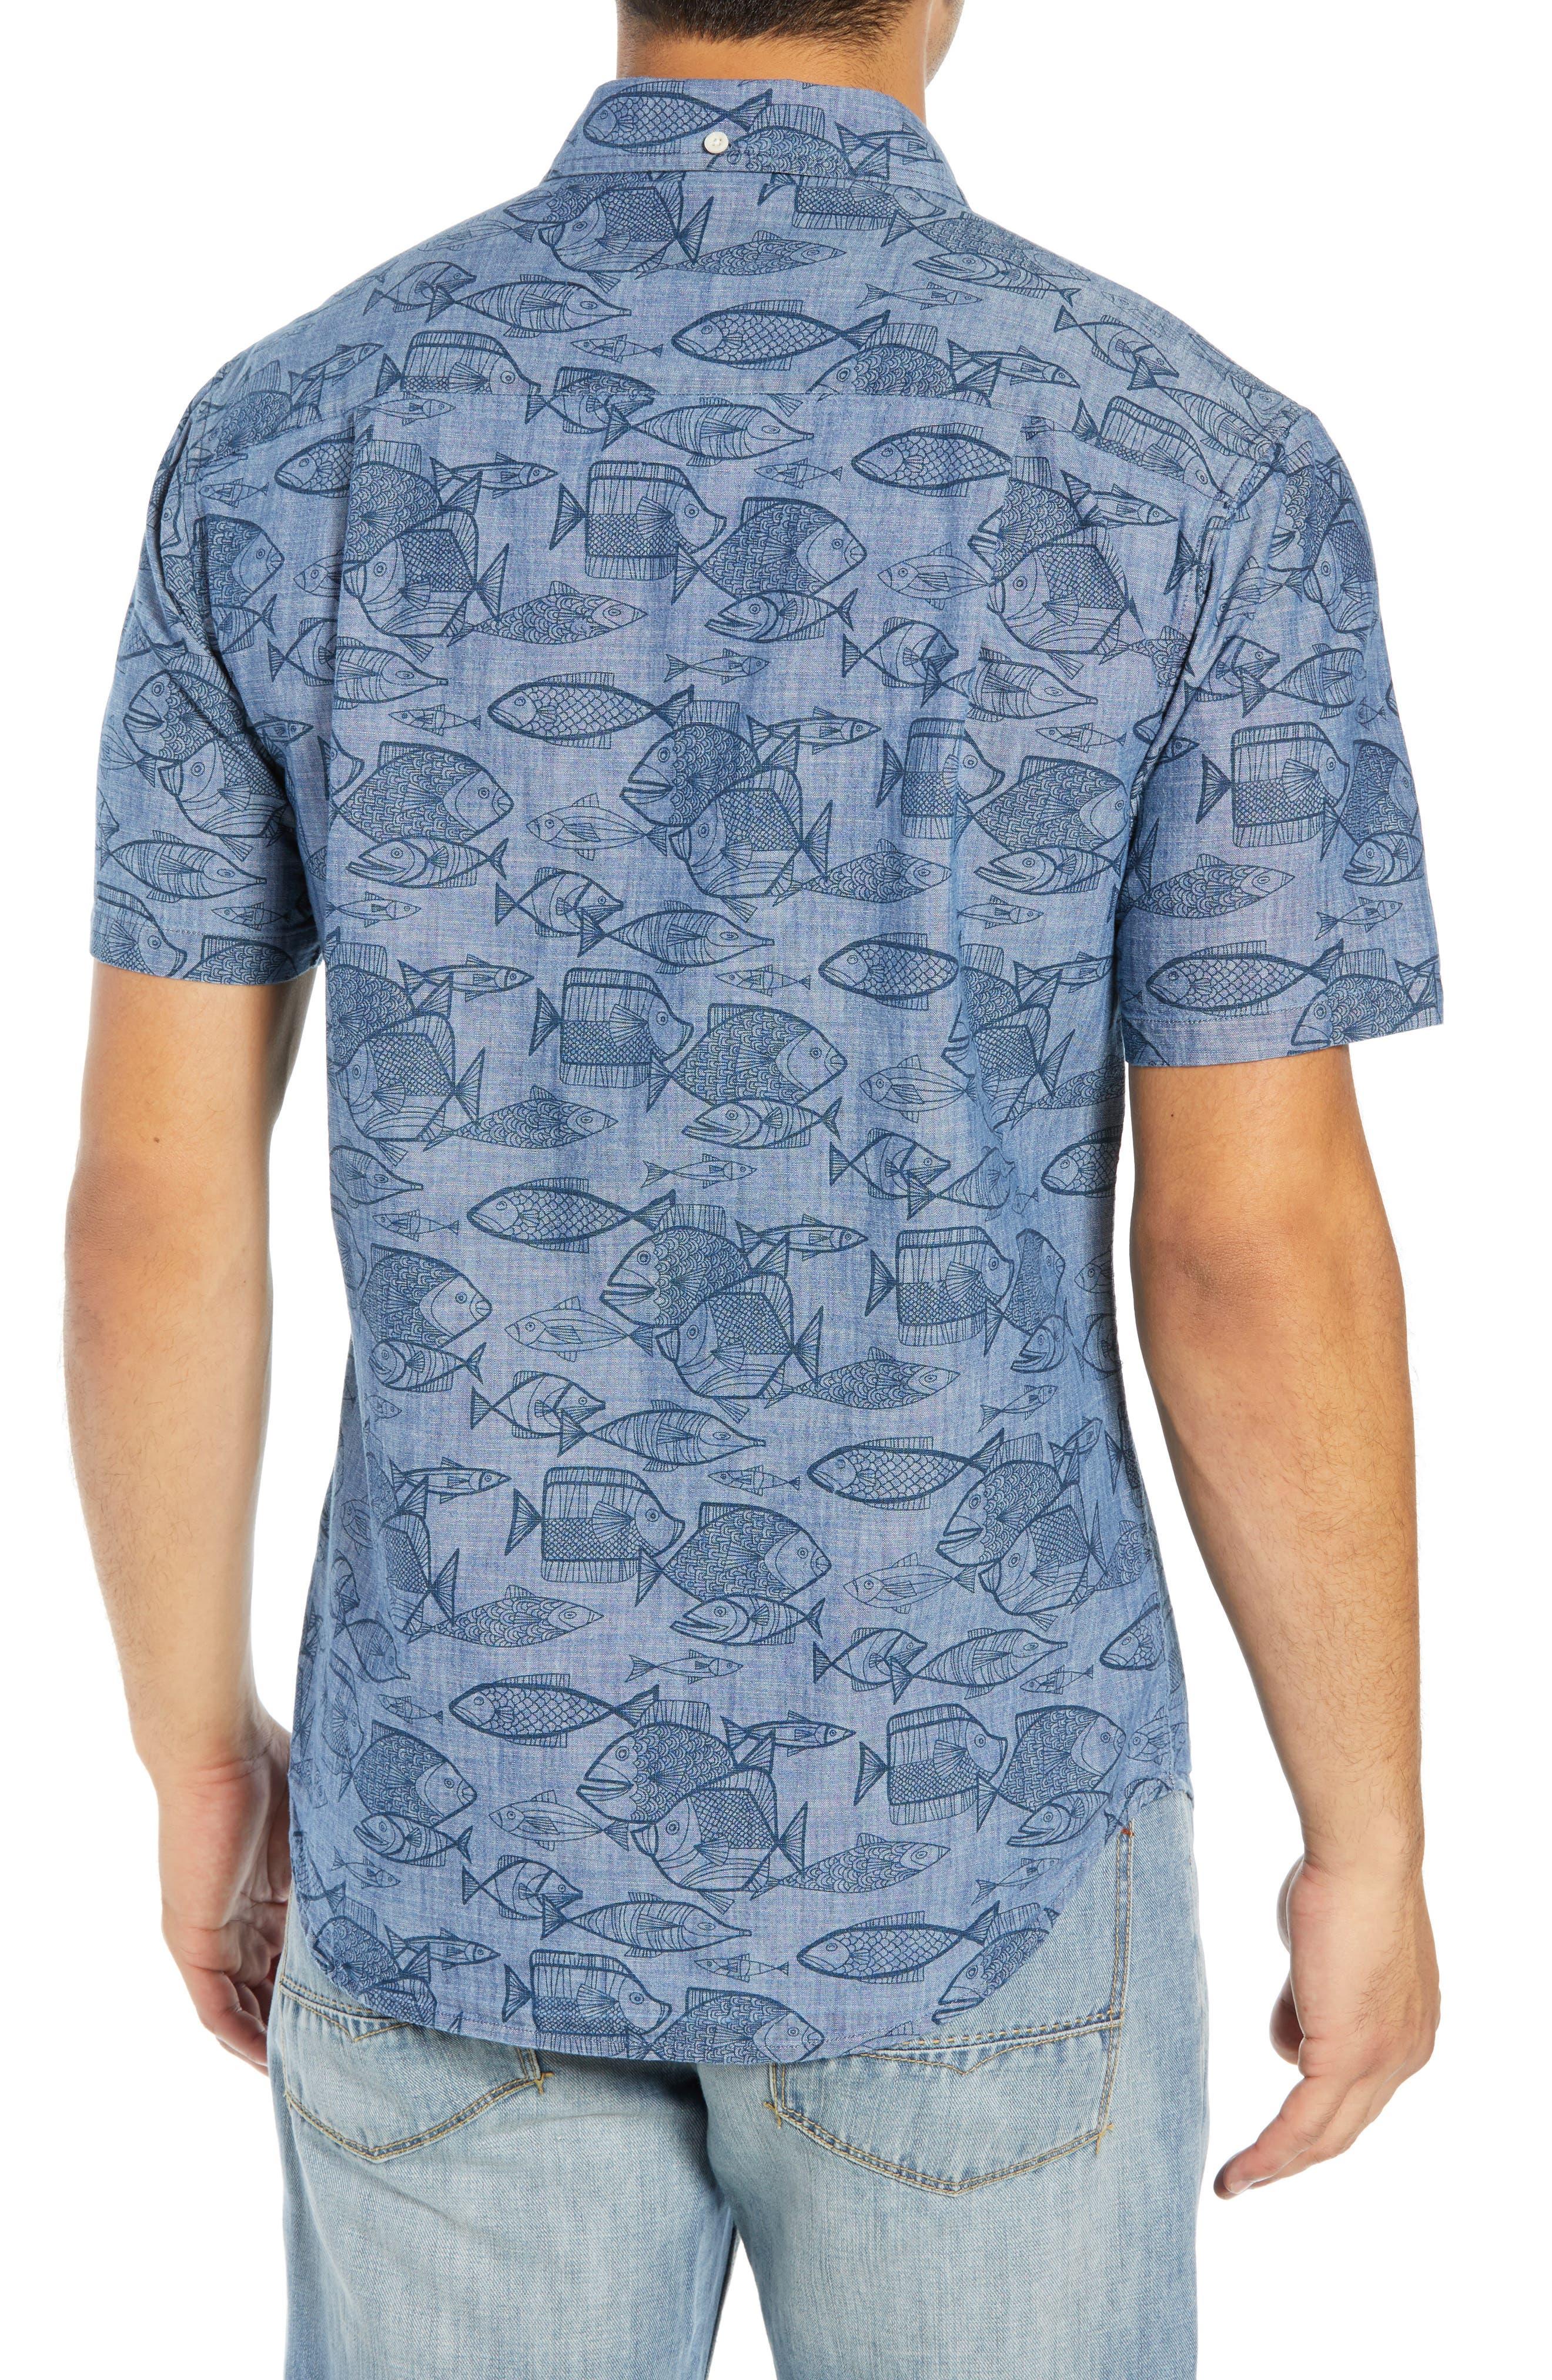 REYN SPOONER, Kauhulu Tailored Fit Sport Shirt, Alternate thumbnail 3, color, CHAMBRAY BLUE